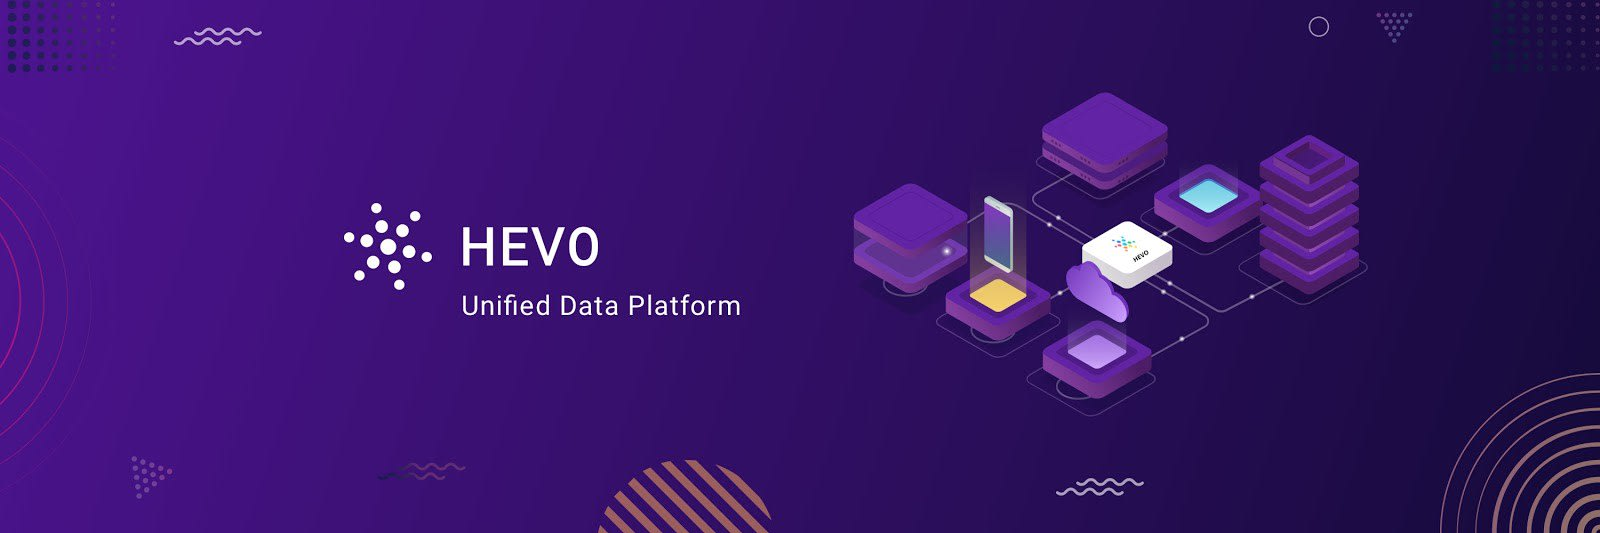 Oracle replication tools: Hevo Logo